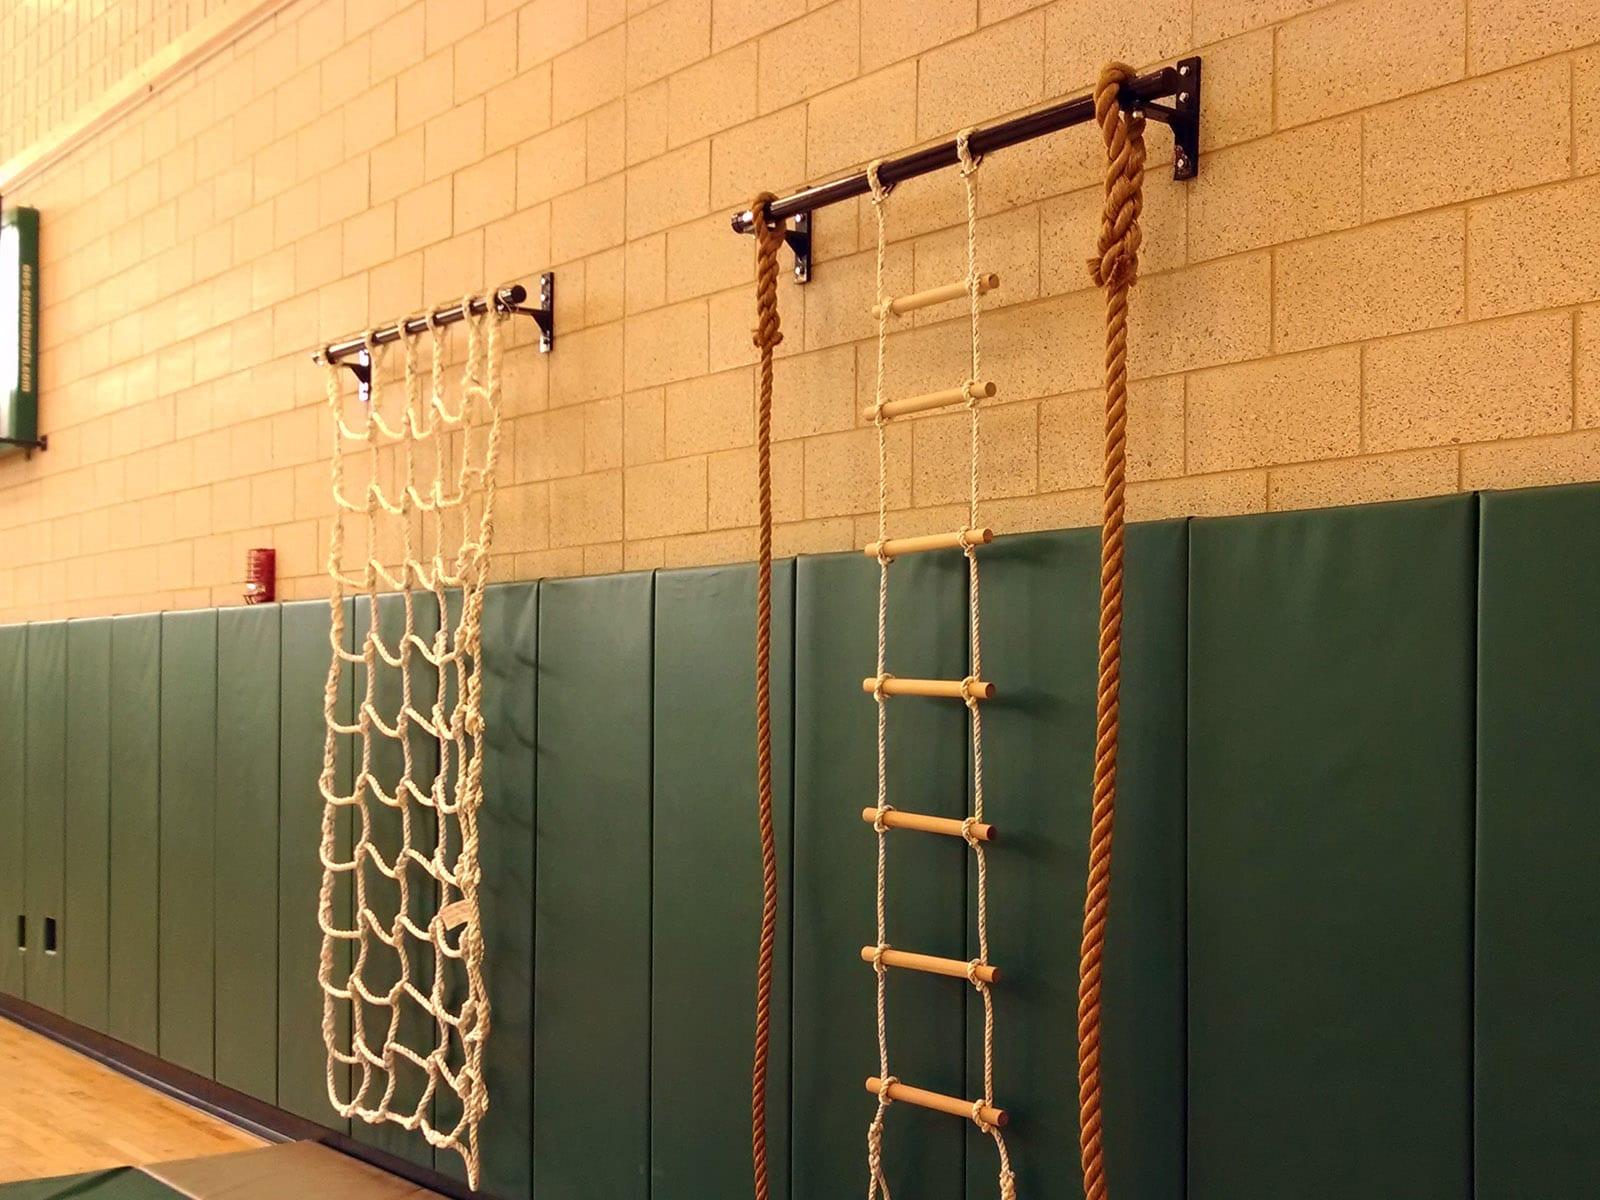 Wall Mounted Hanging Bars  WHB Series  Jammar MFG